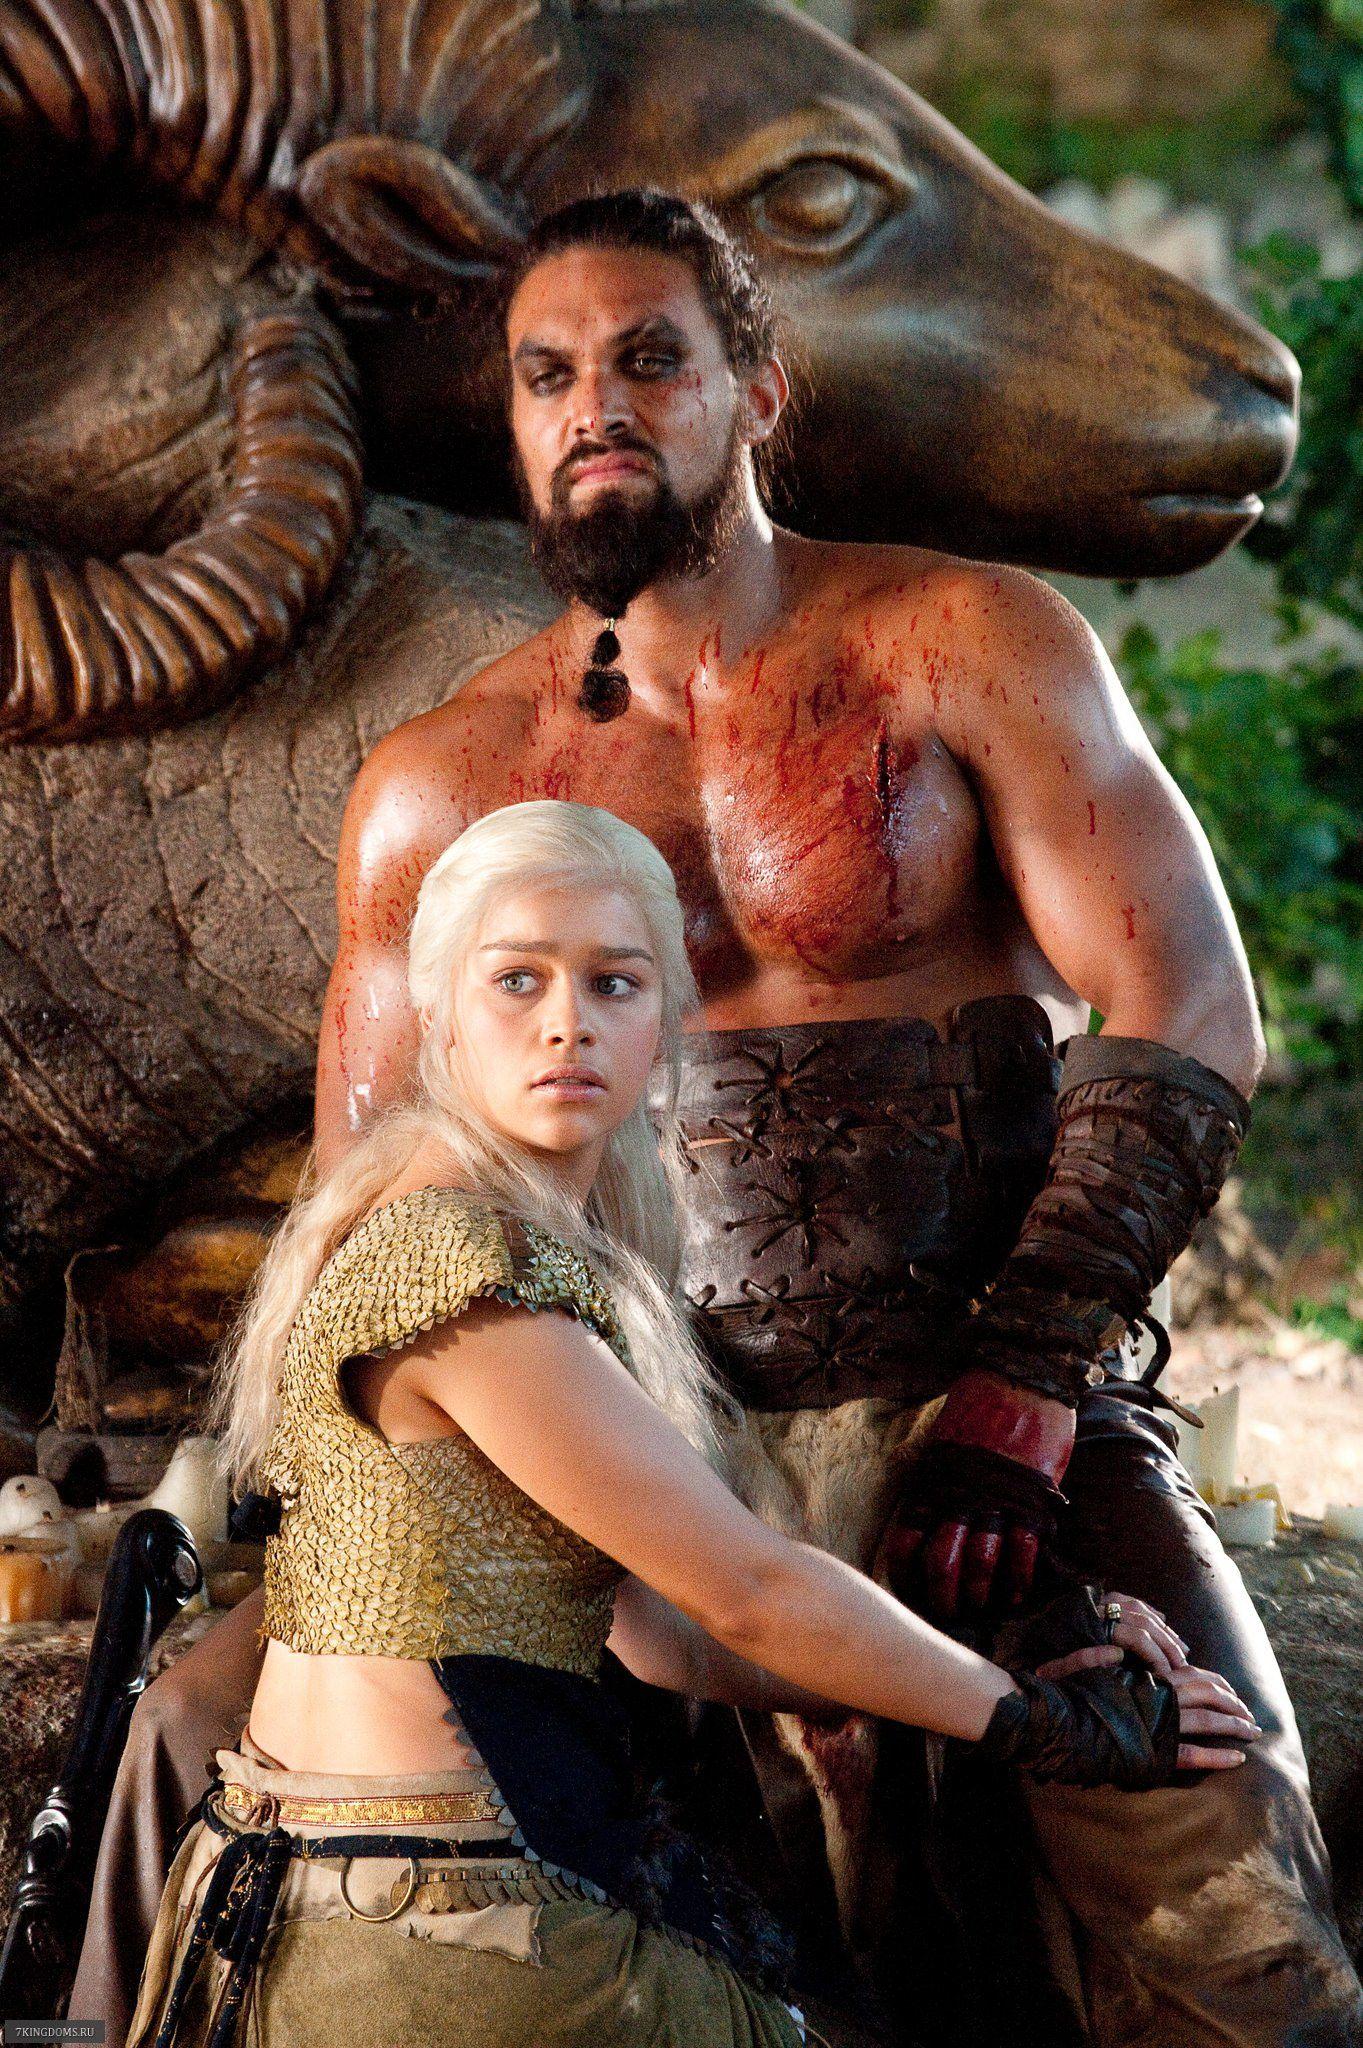 Daenerys targaryen and khal drogo wallpaper daenerys targaryen wedding - Emilia Clarke Daenerys Targaryen Jason Momoa Drogo